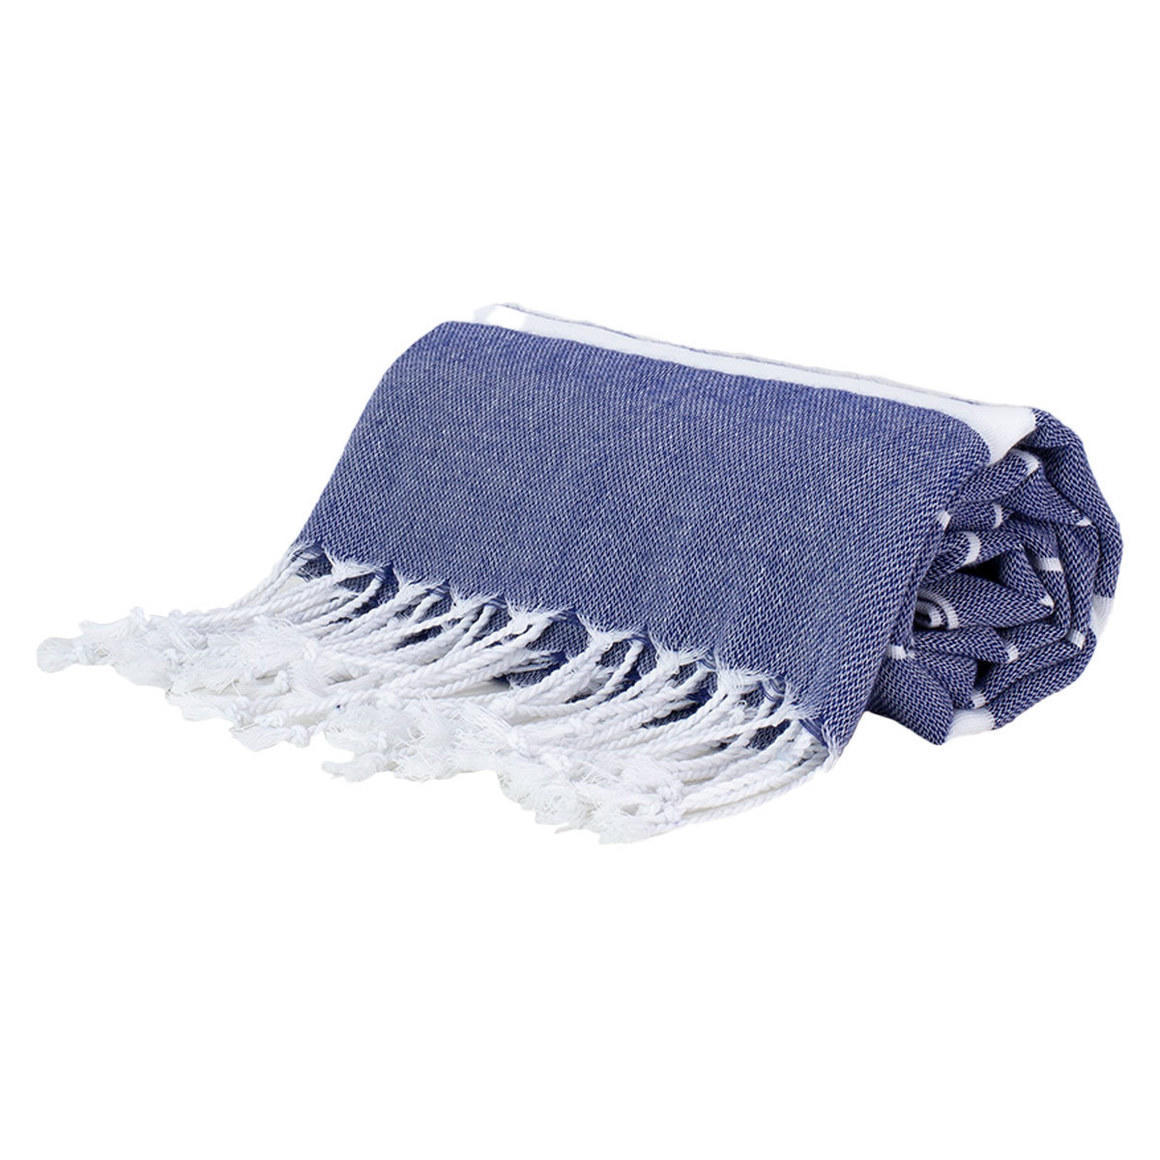 THIN TURKISH TOWELS NAVY STRIPES | Trada Marketplace